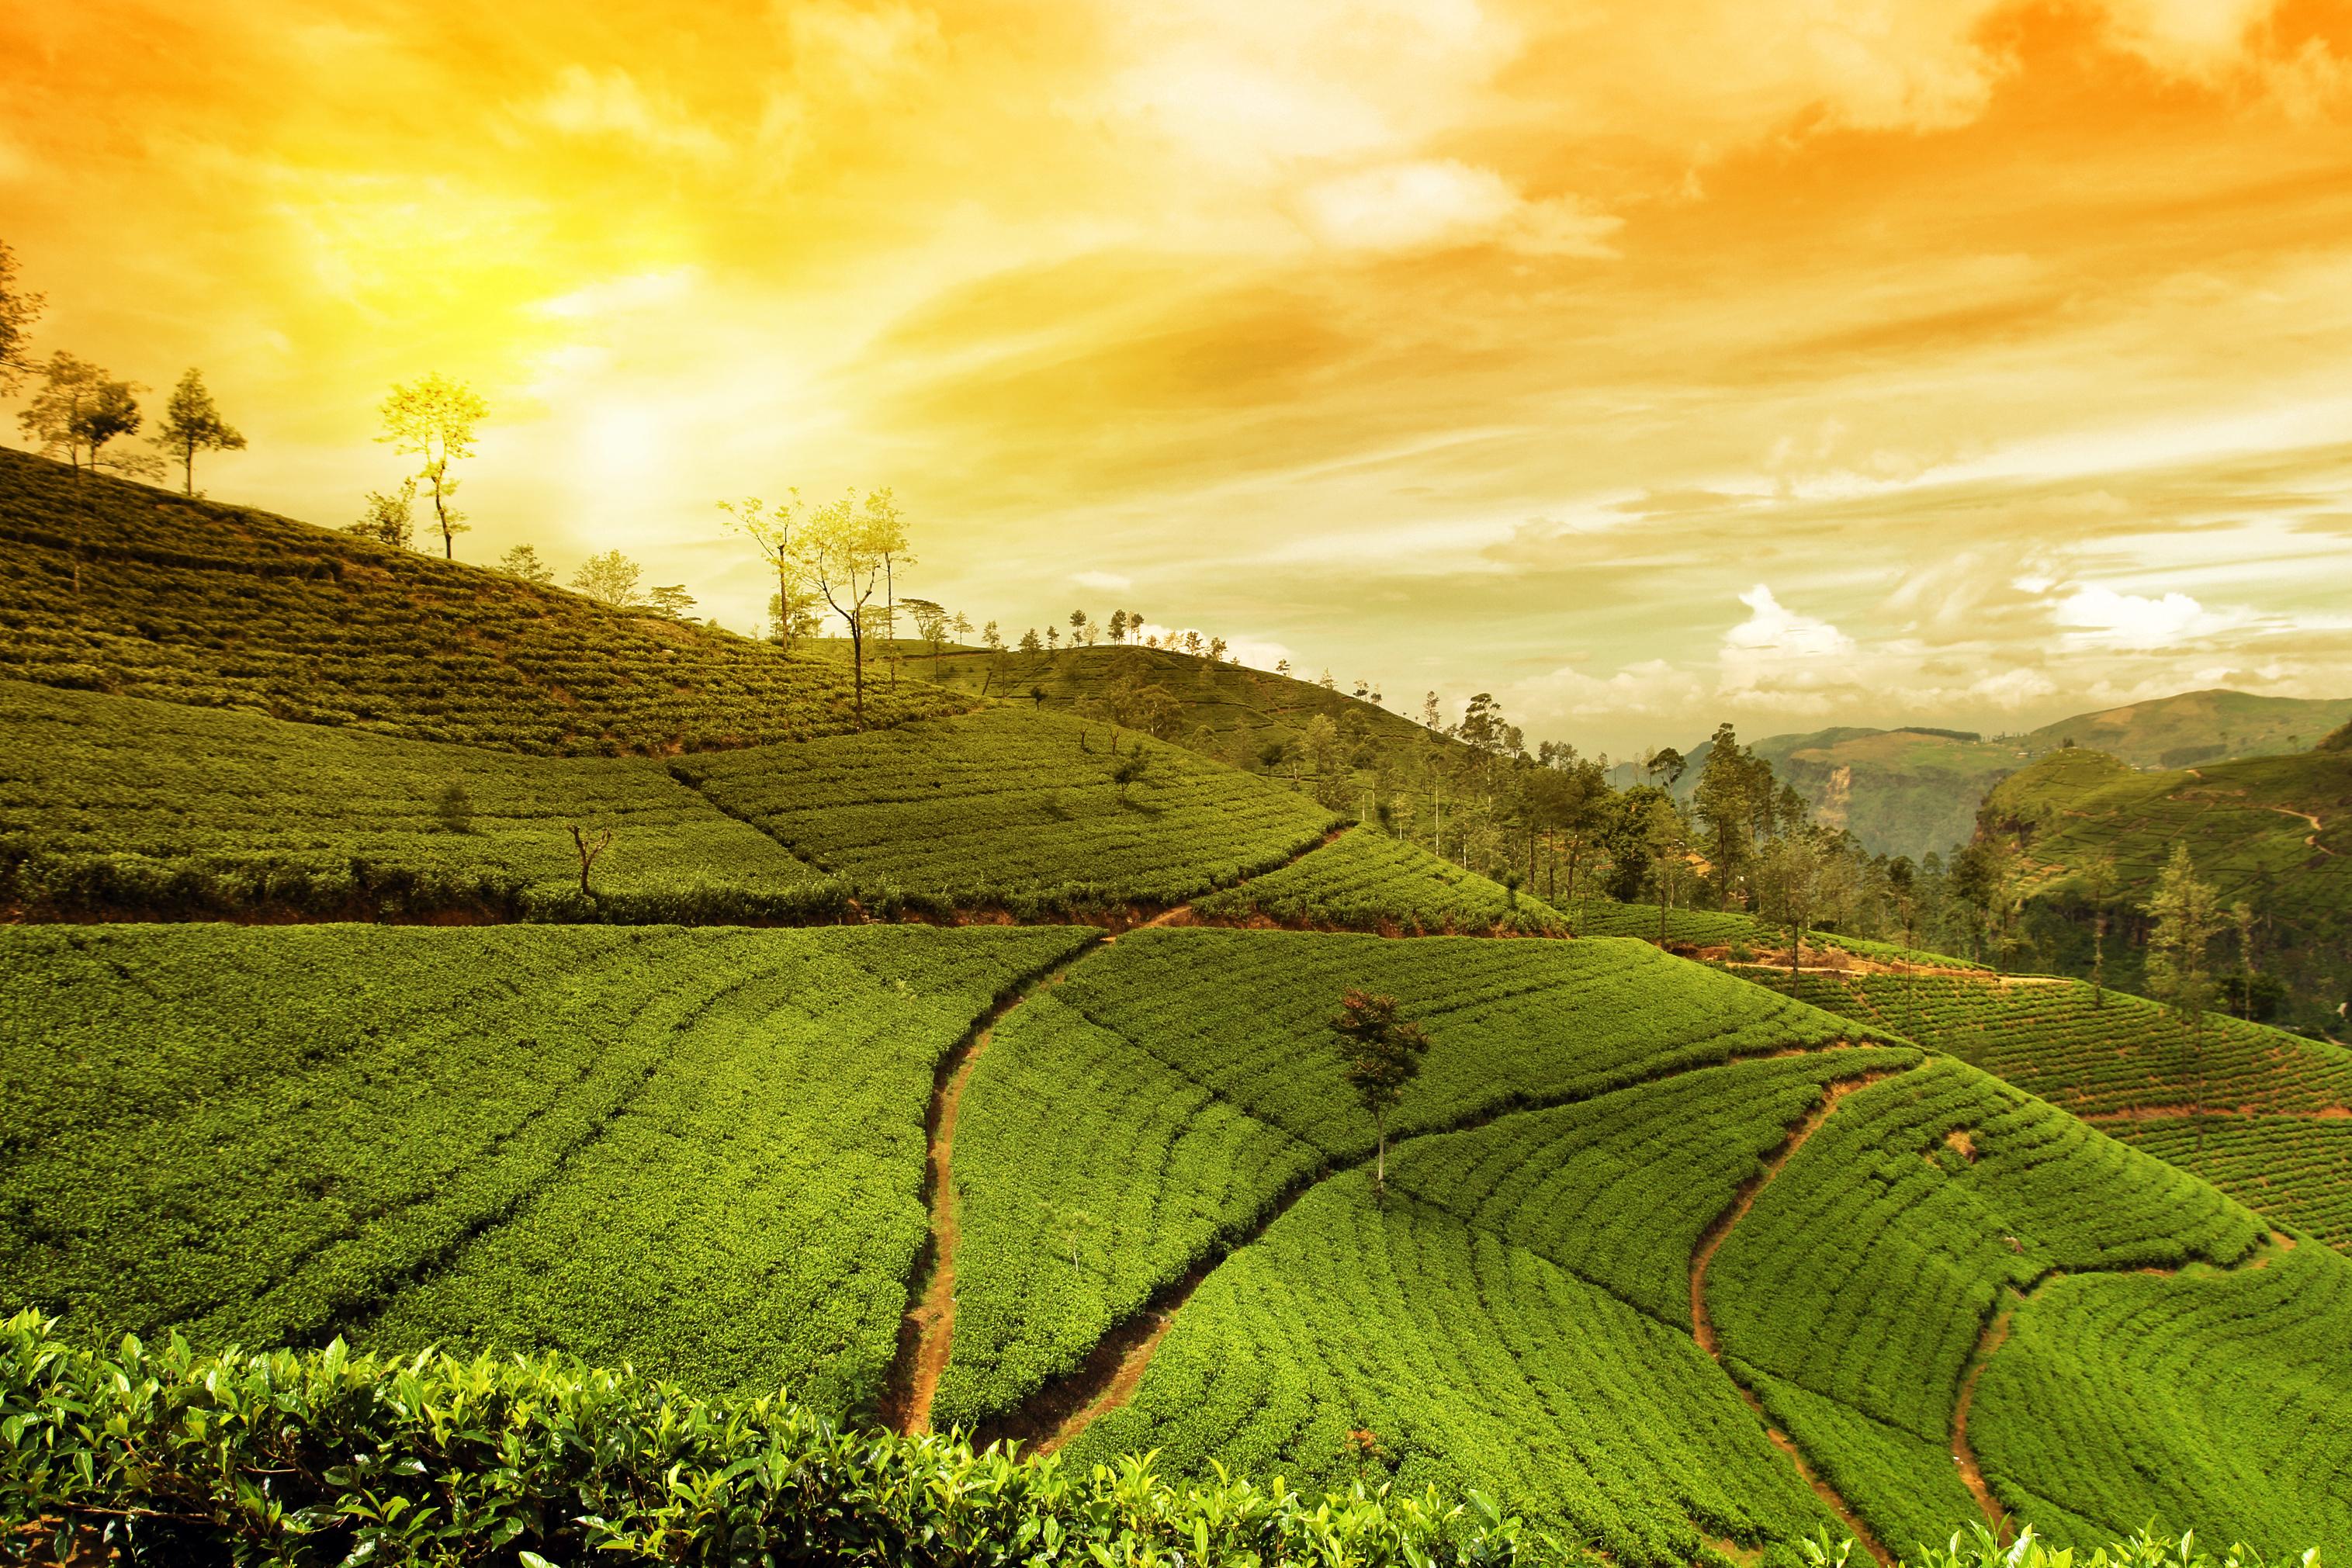 Hill Country, Sri Lanka